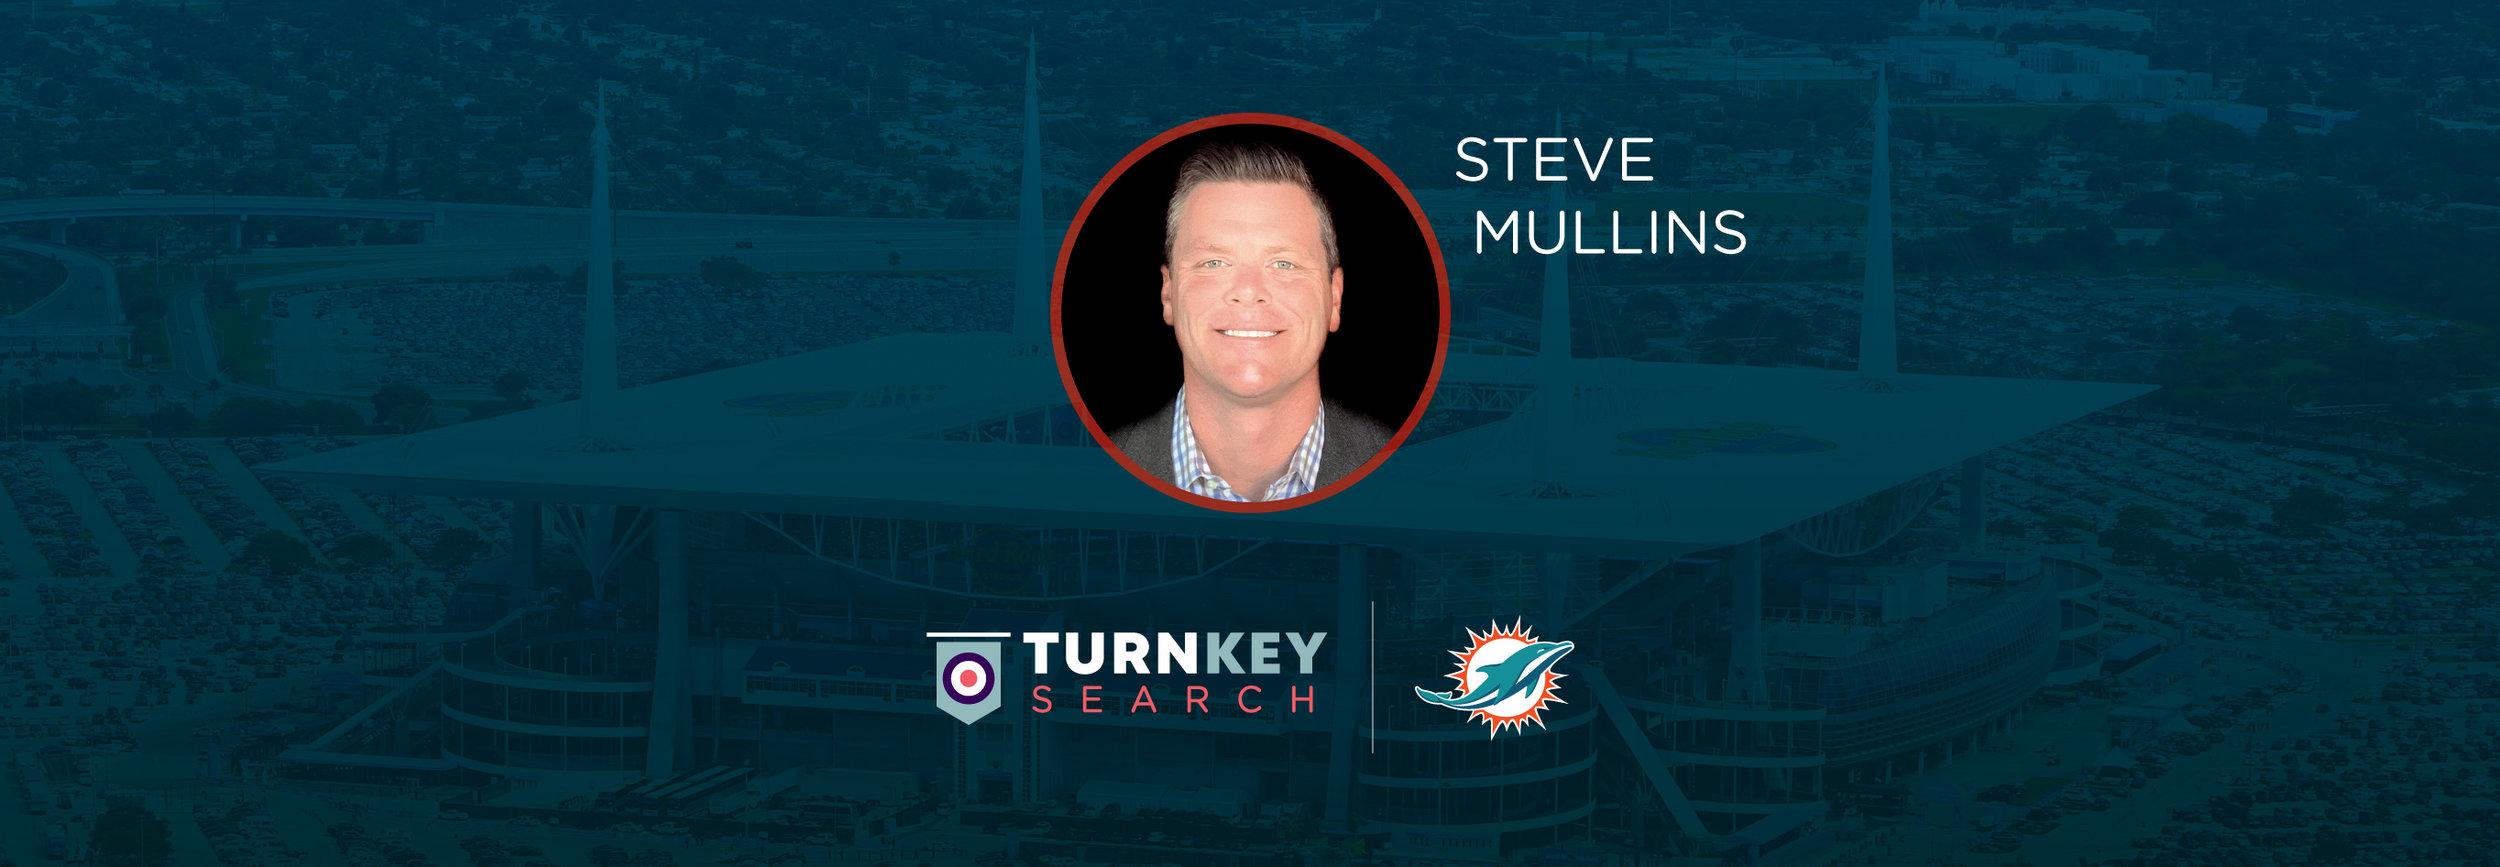 Miami-Dolphins-Turnkey Search.jpg